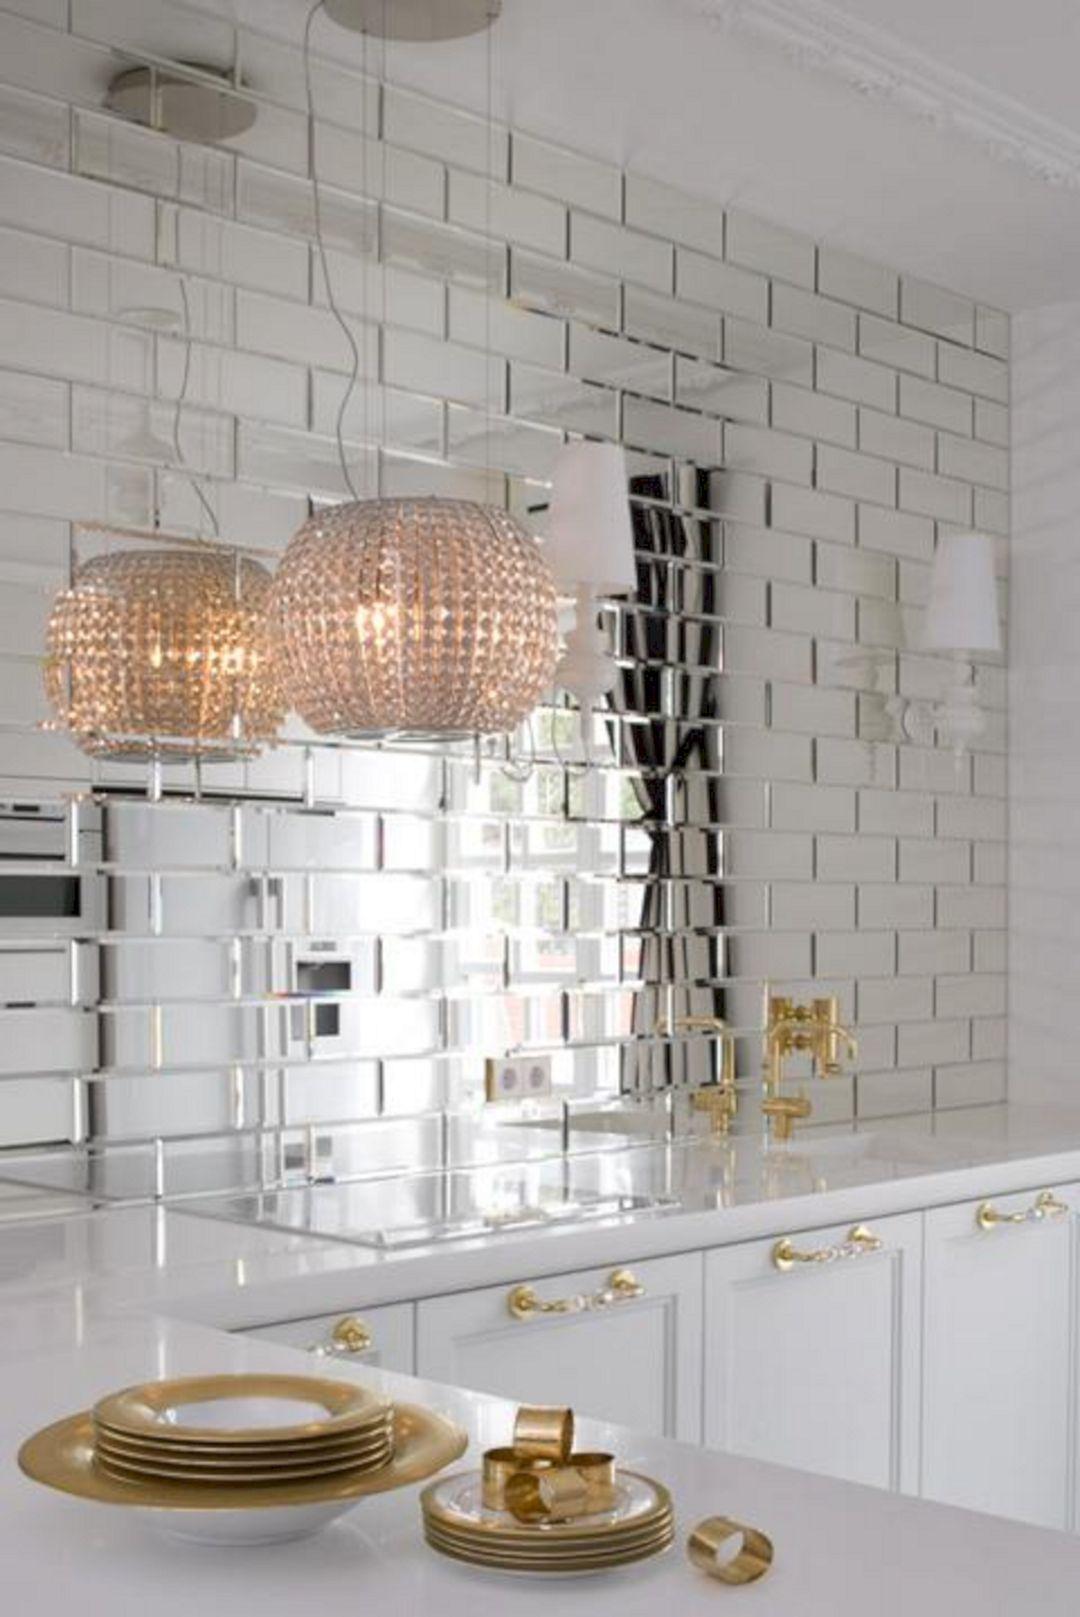 9 Amazing Mirror Bathroom Tiles For Bathroom Looks Luxurious